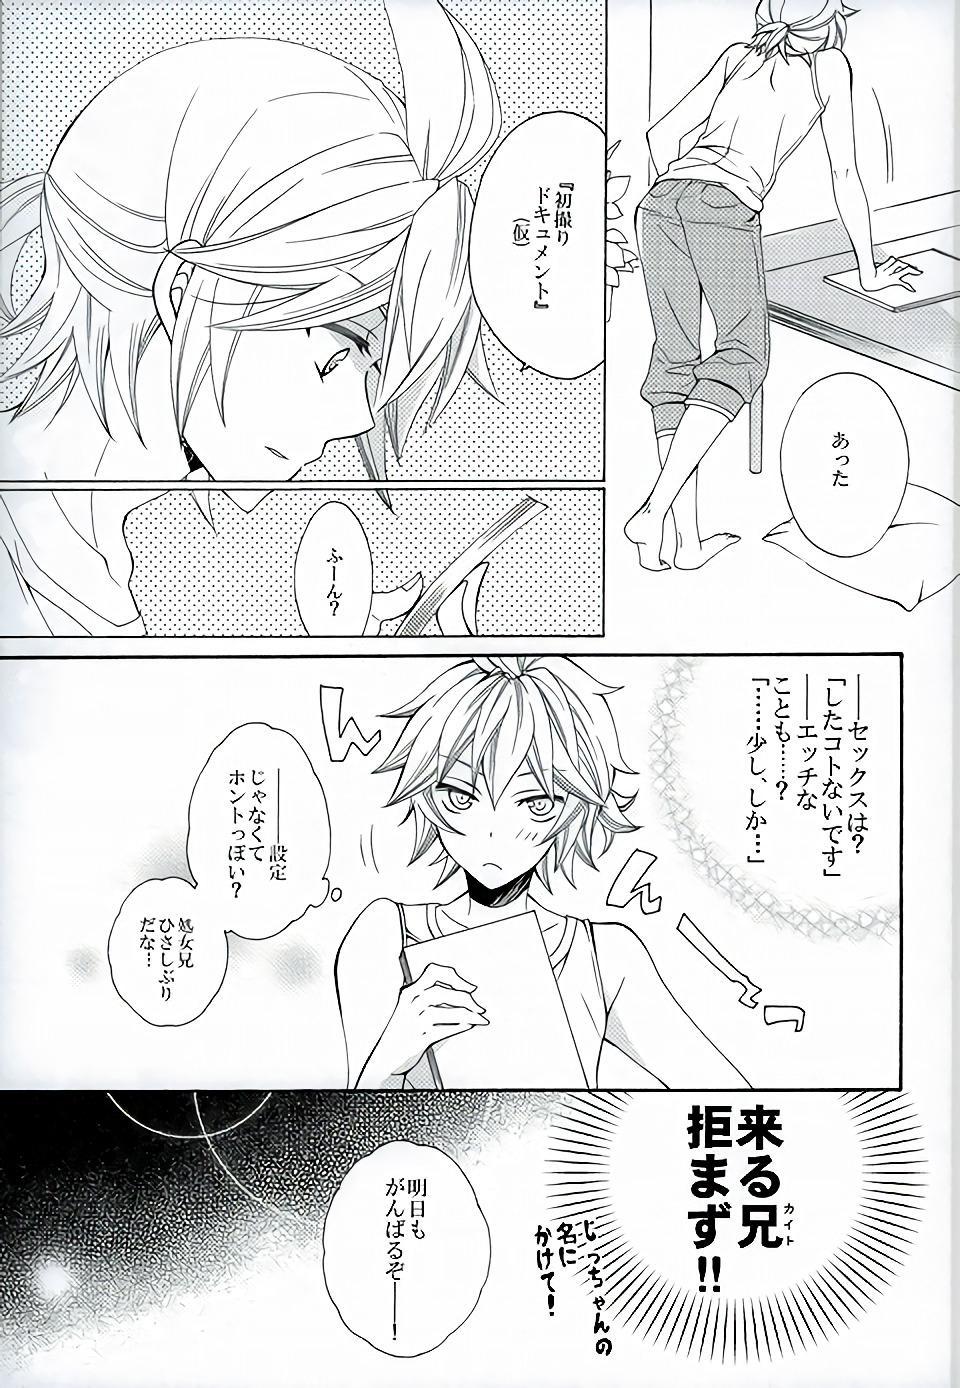 Hatsudori Document 11